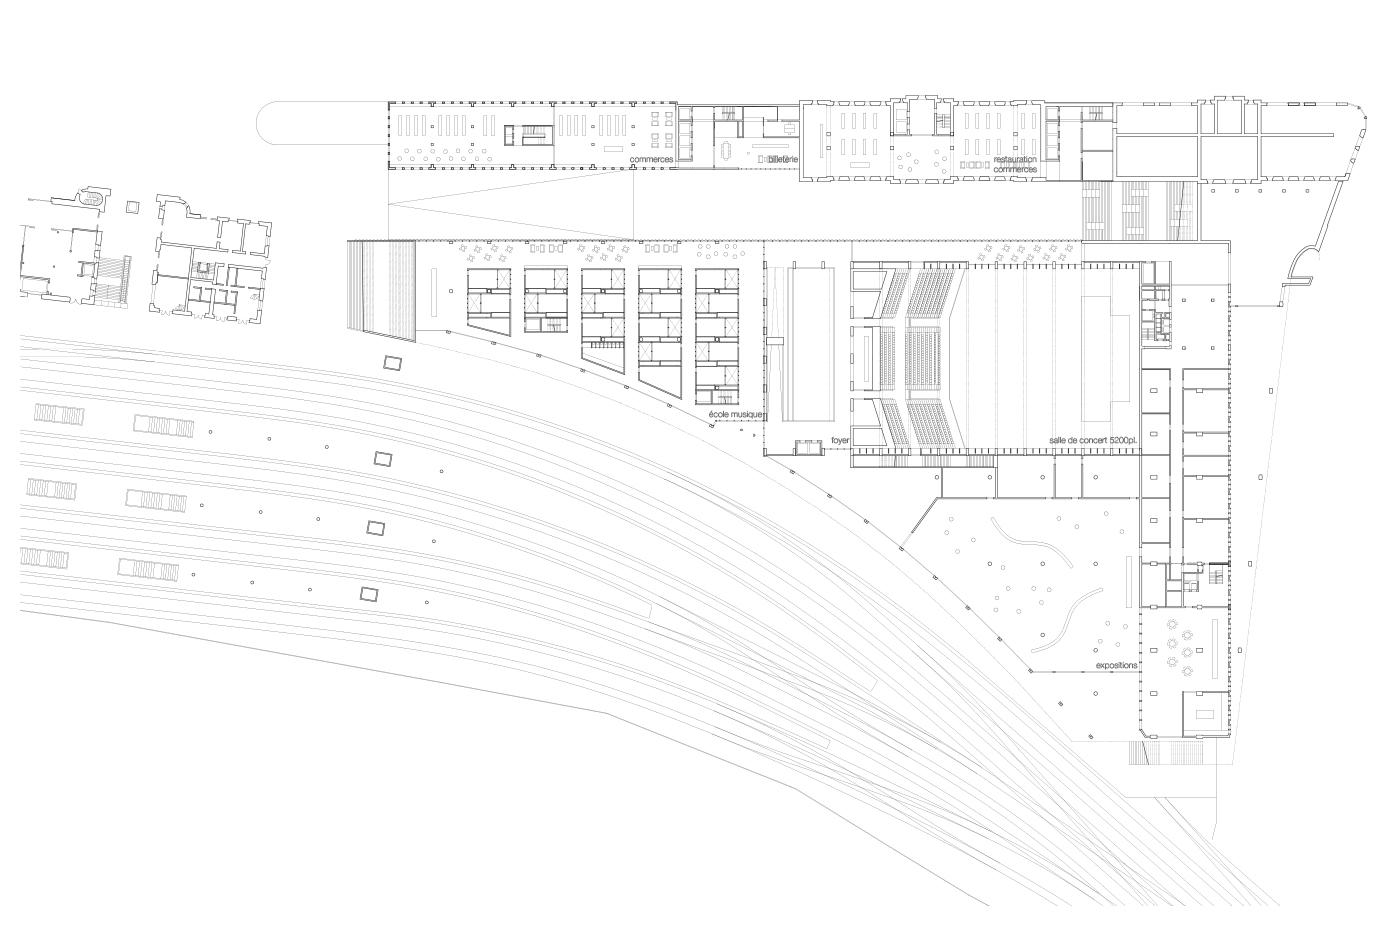 La Rasude - Pôle gare Lausanne - culture - plan